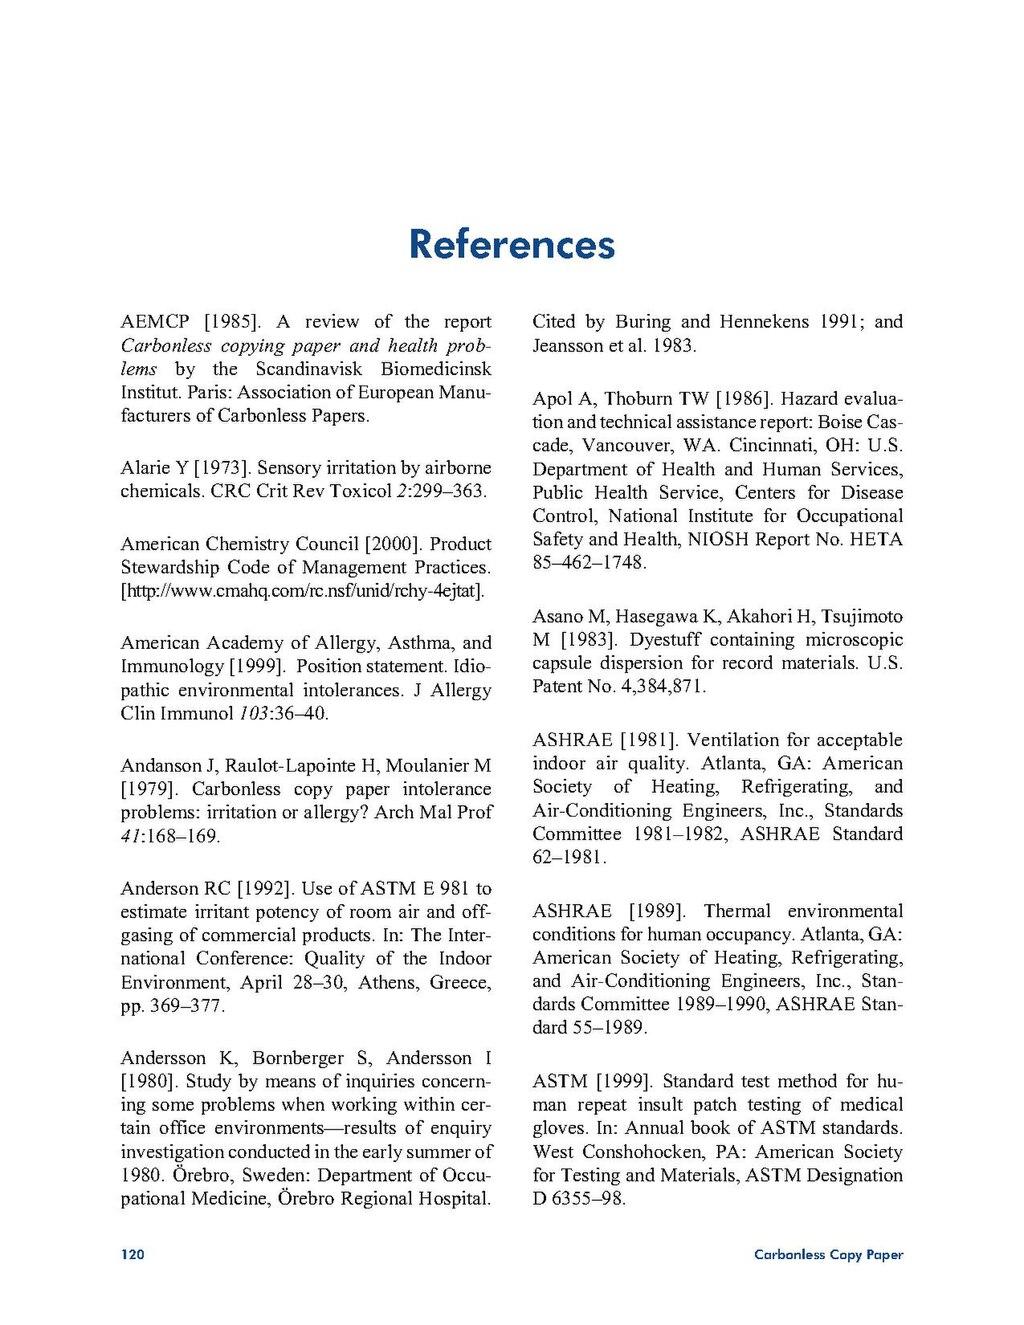 page niosh hazard review of carbonless copy paper pdf 141